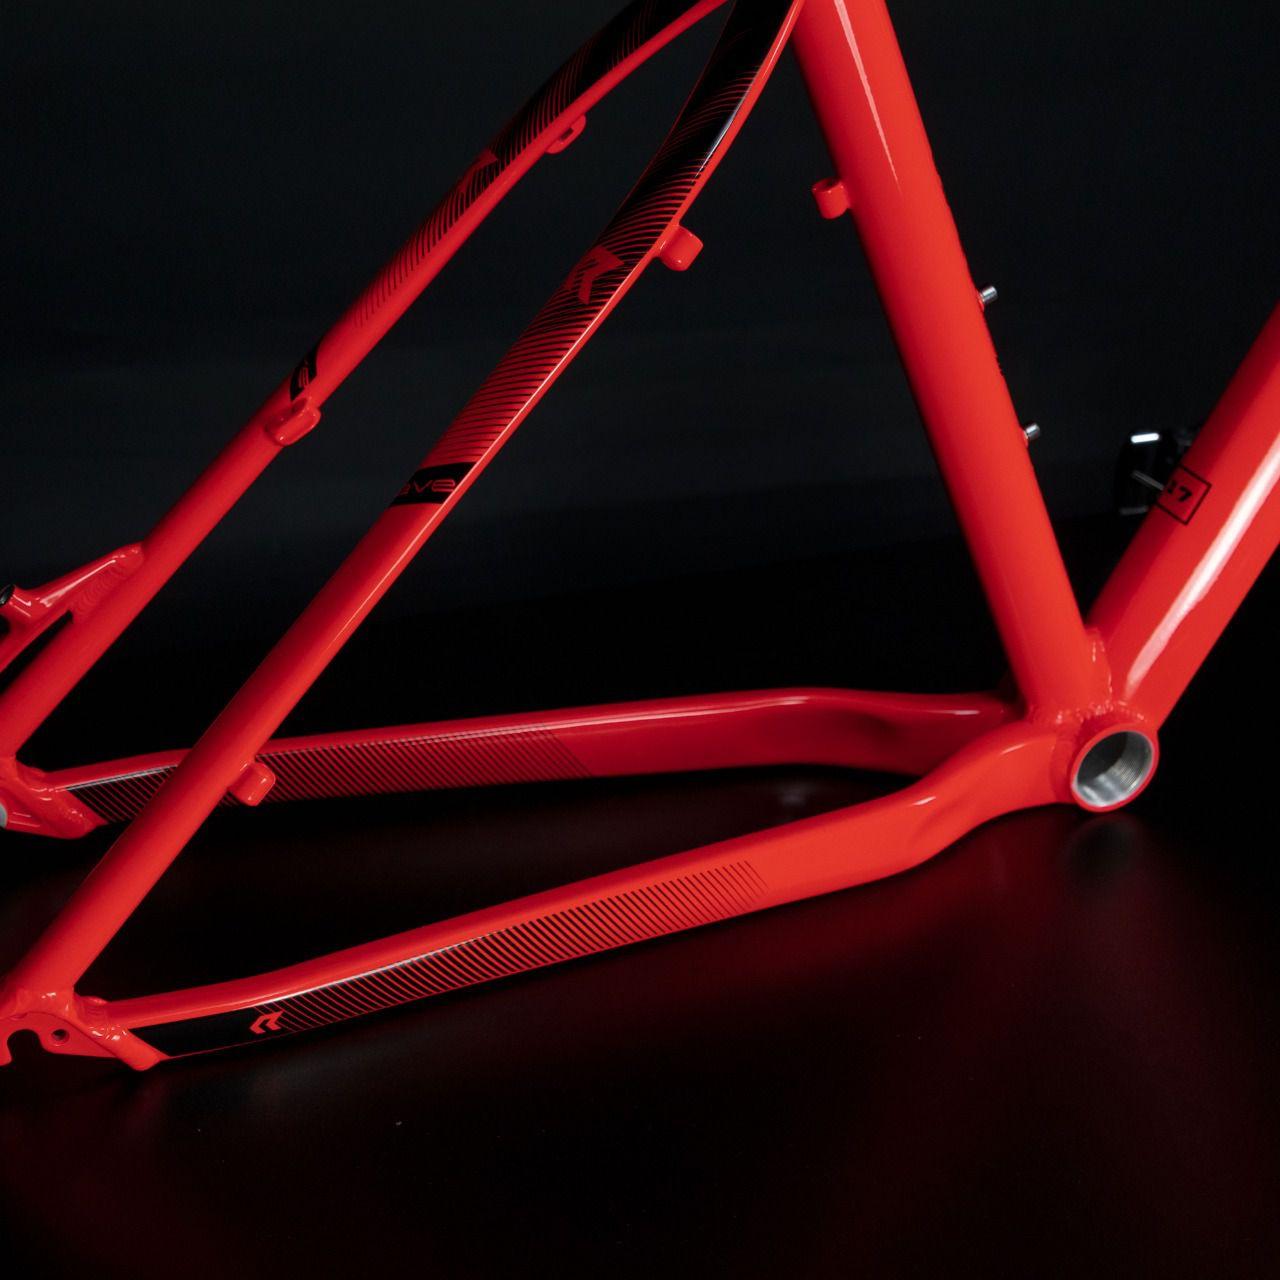 Quadro RAVA Cave Aro 29 MTB Alumínio cor Vermelho Neon 2019 c/ kit 5 peças